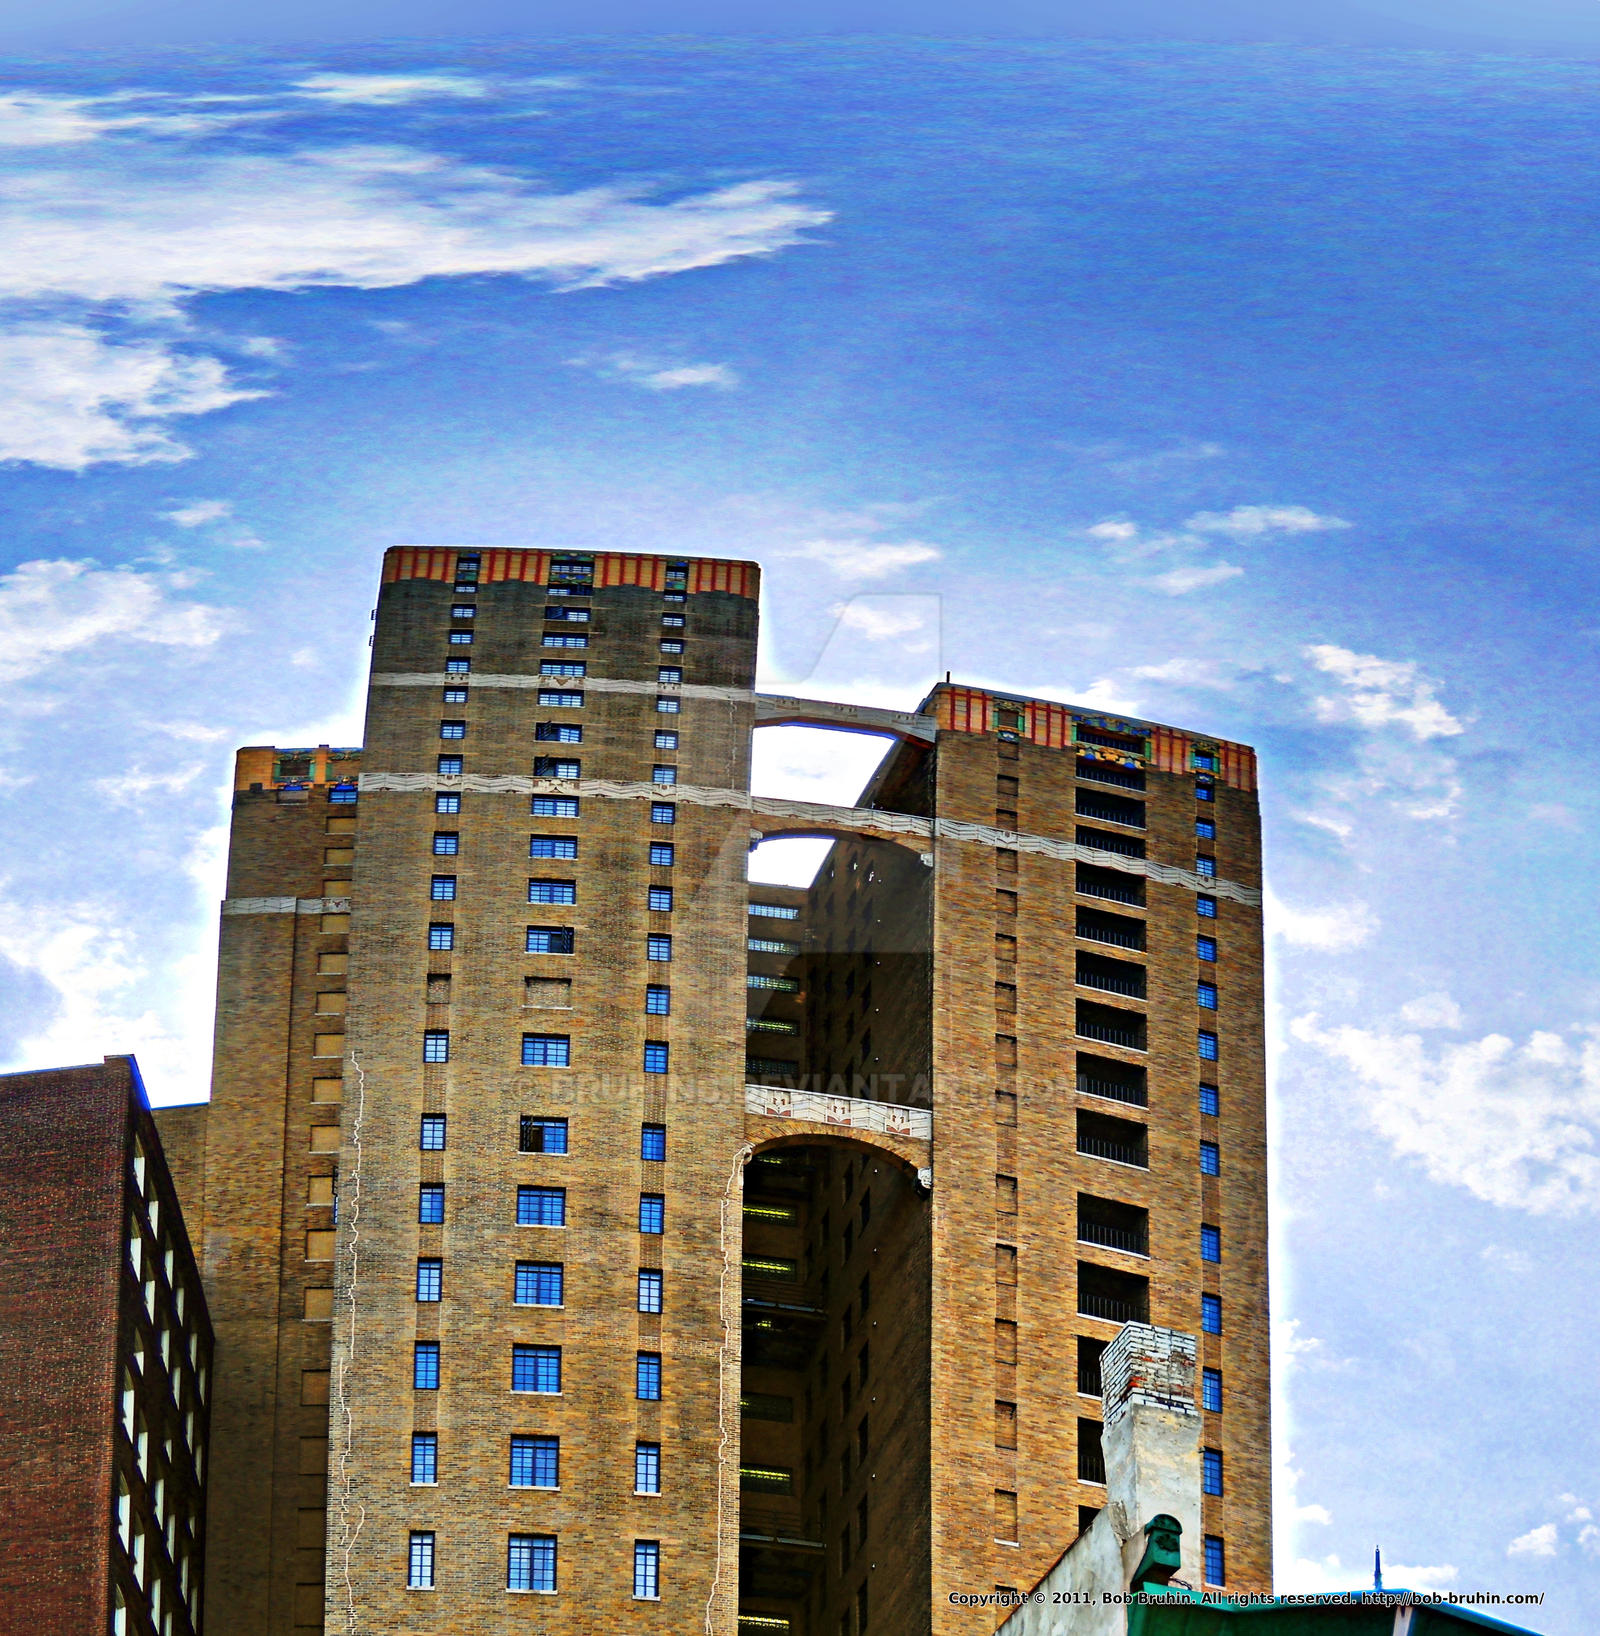 Panorama 1068 by bruhinb